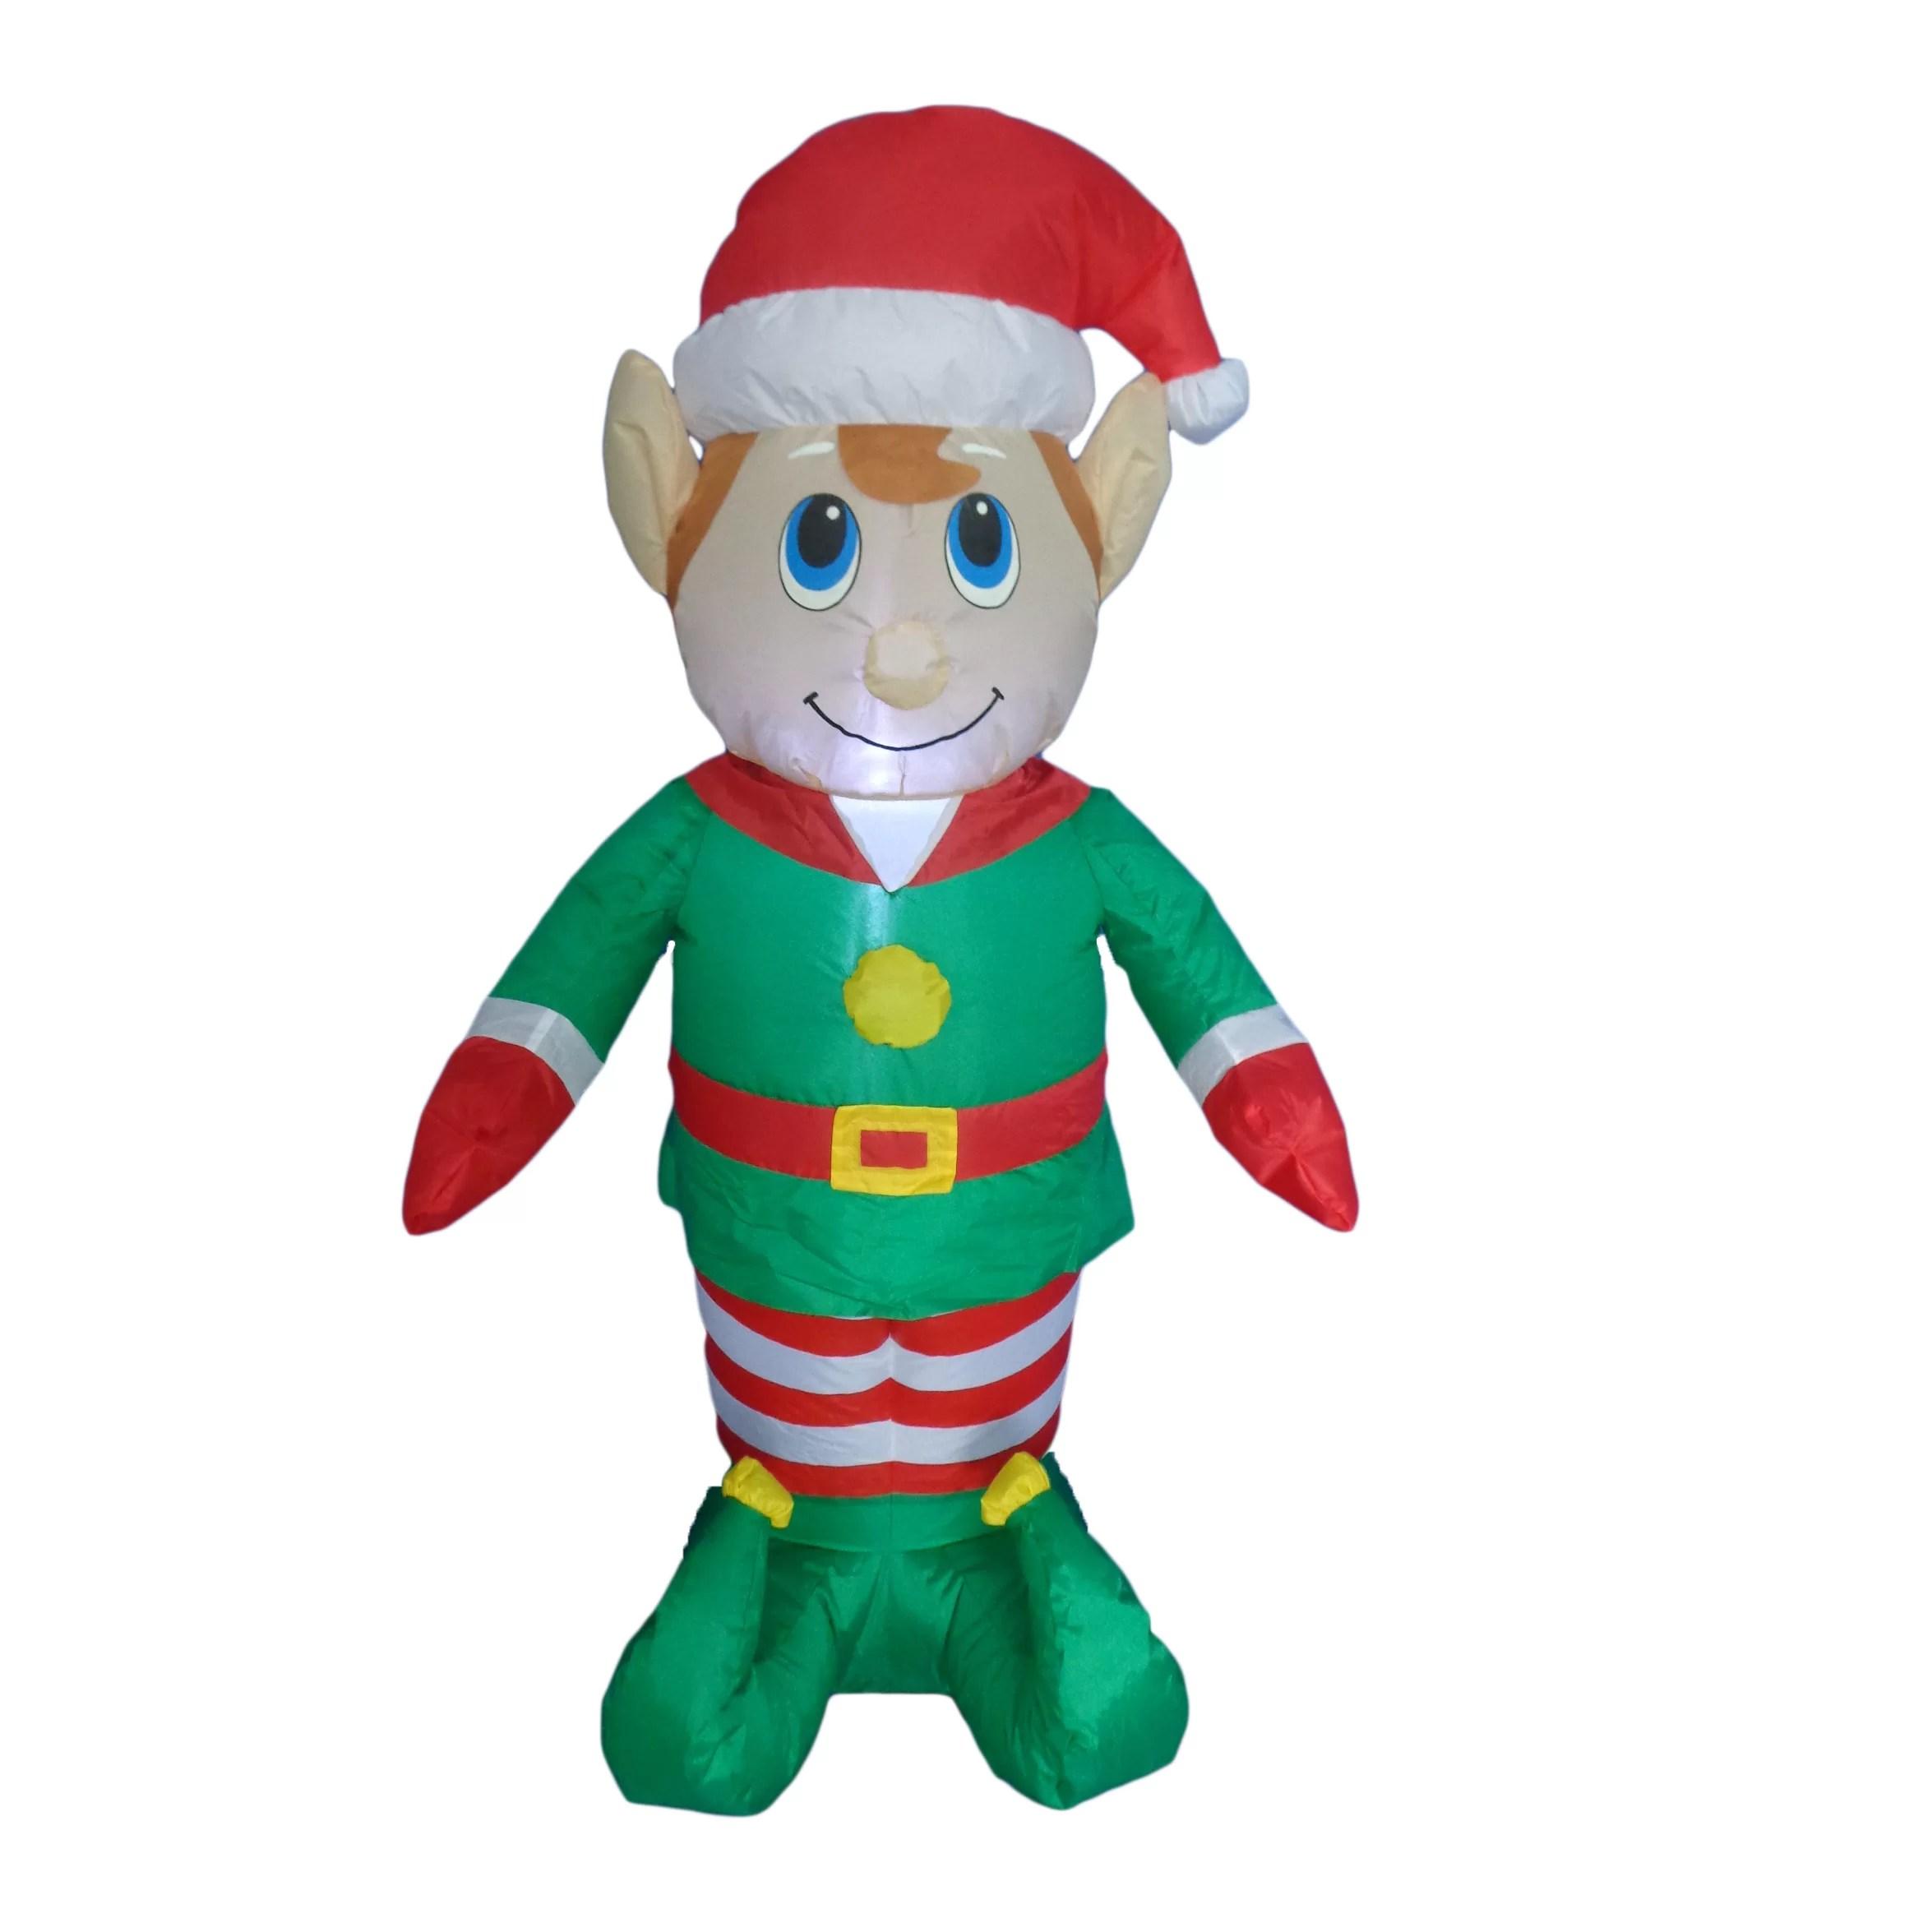 BZB Goods Christmas Inflatable Elf Amp Reviews Wayfair